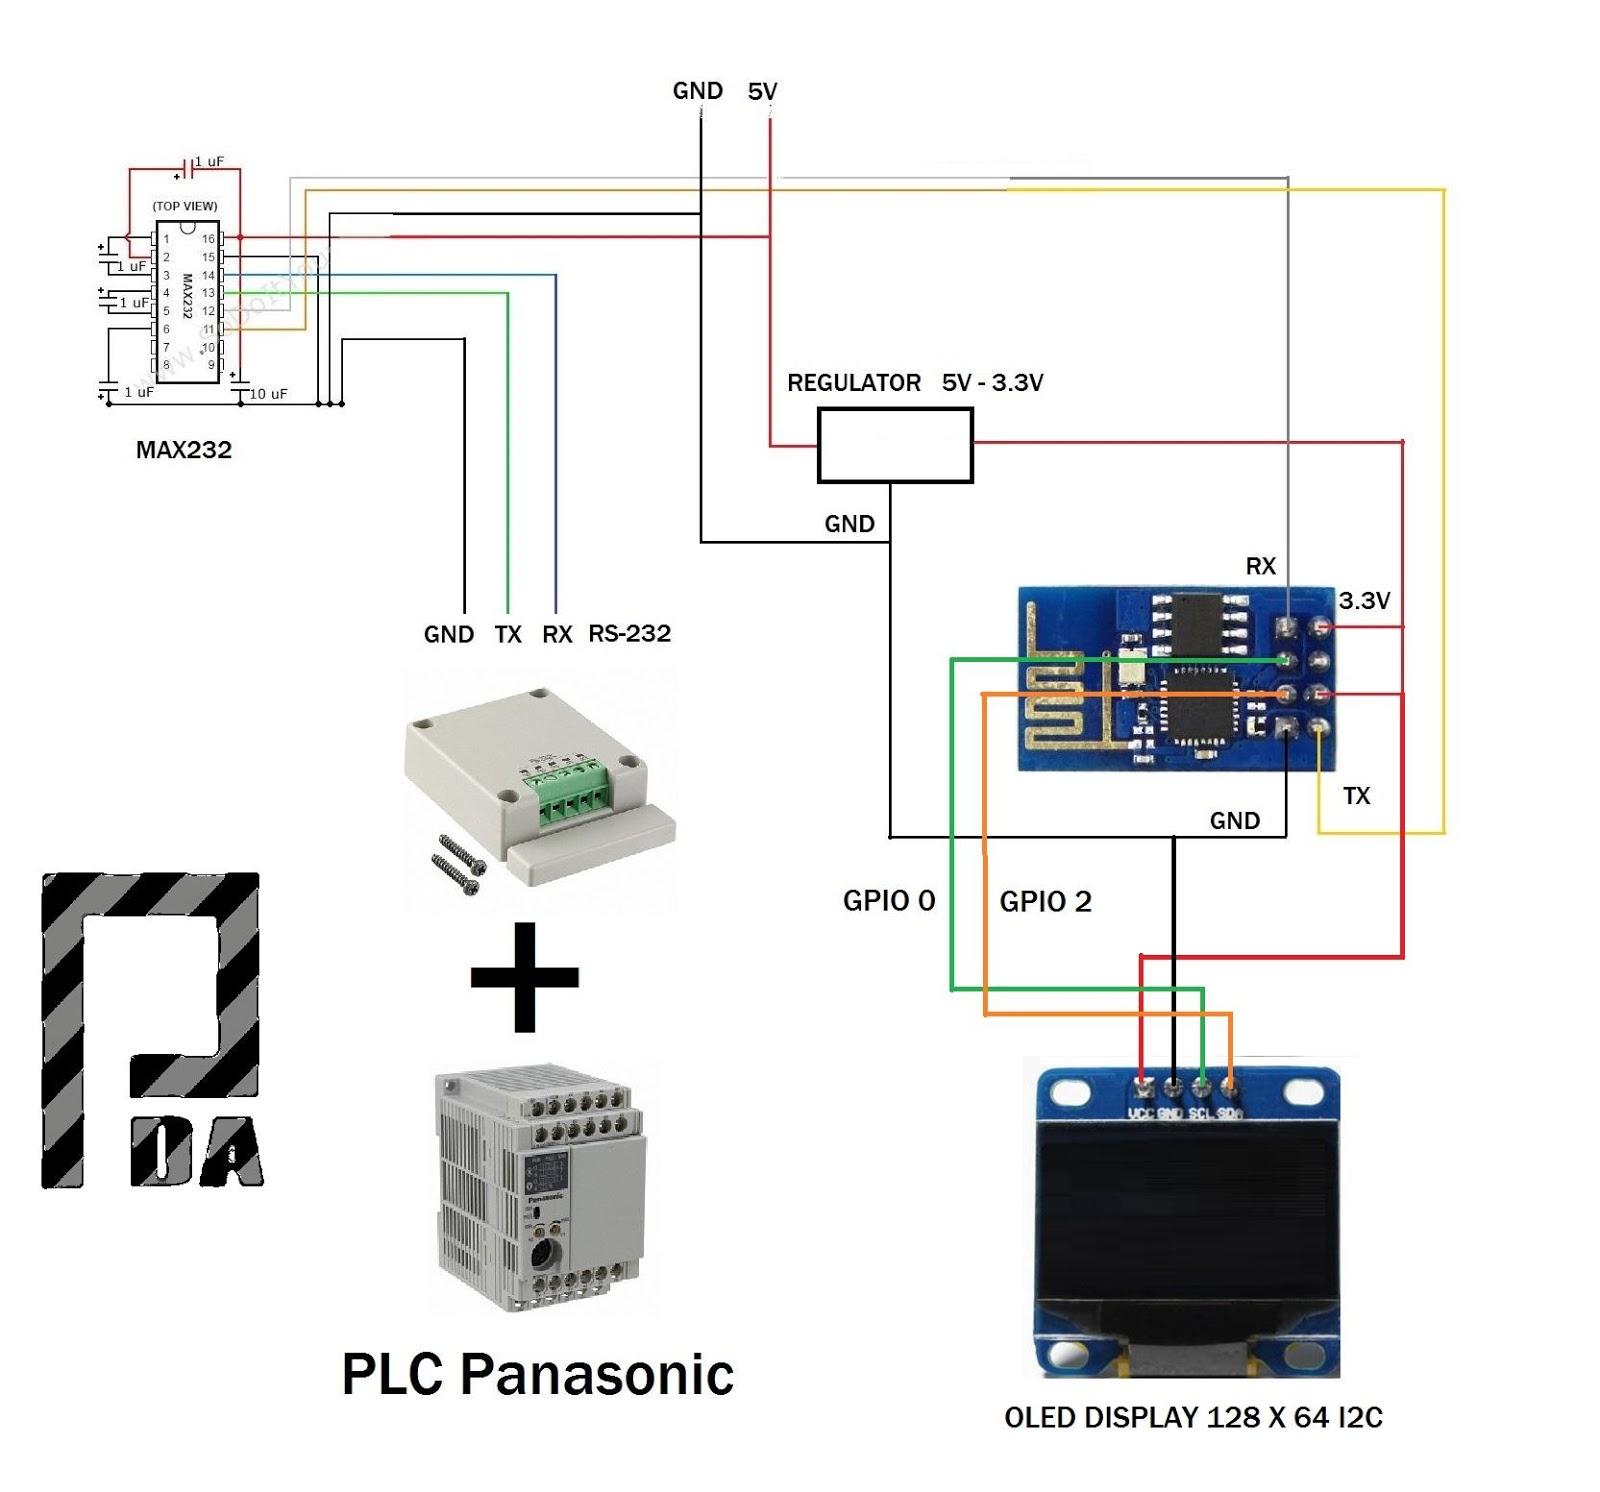 Esp8266 Scada Svg Modbus Rtu Display Oled Plc Panasonic Fpx C14r Max232 Pin Diagram An Error Occurred